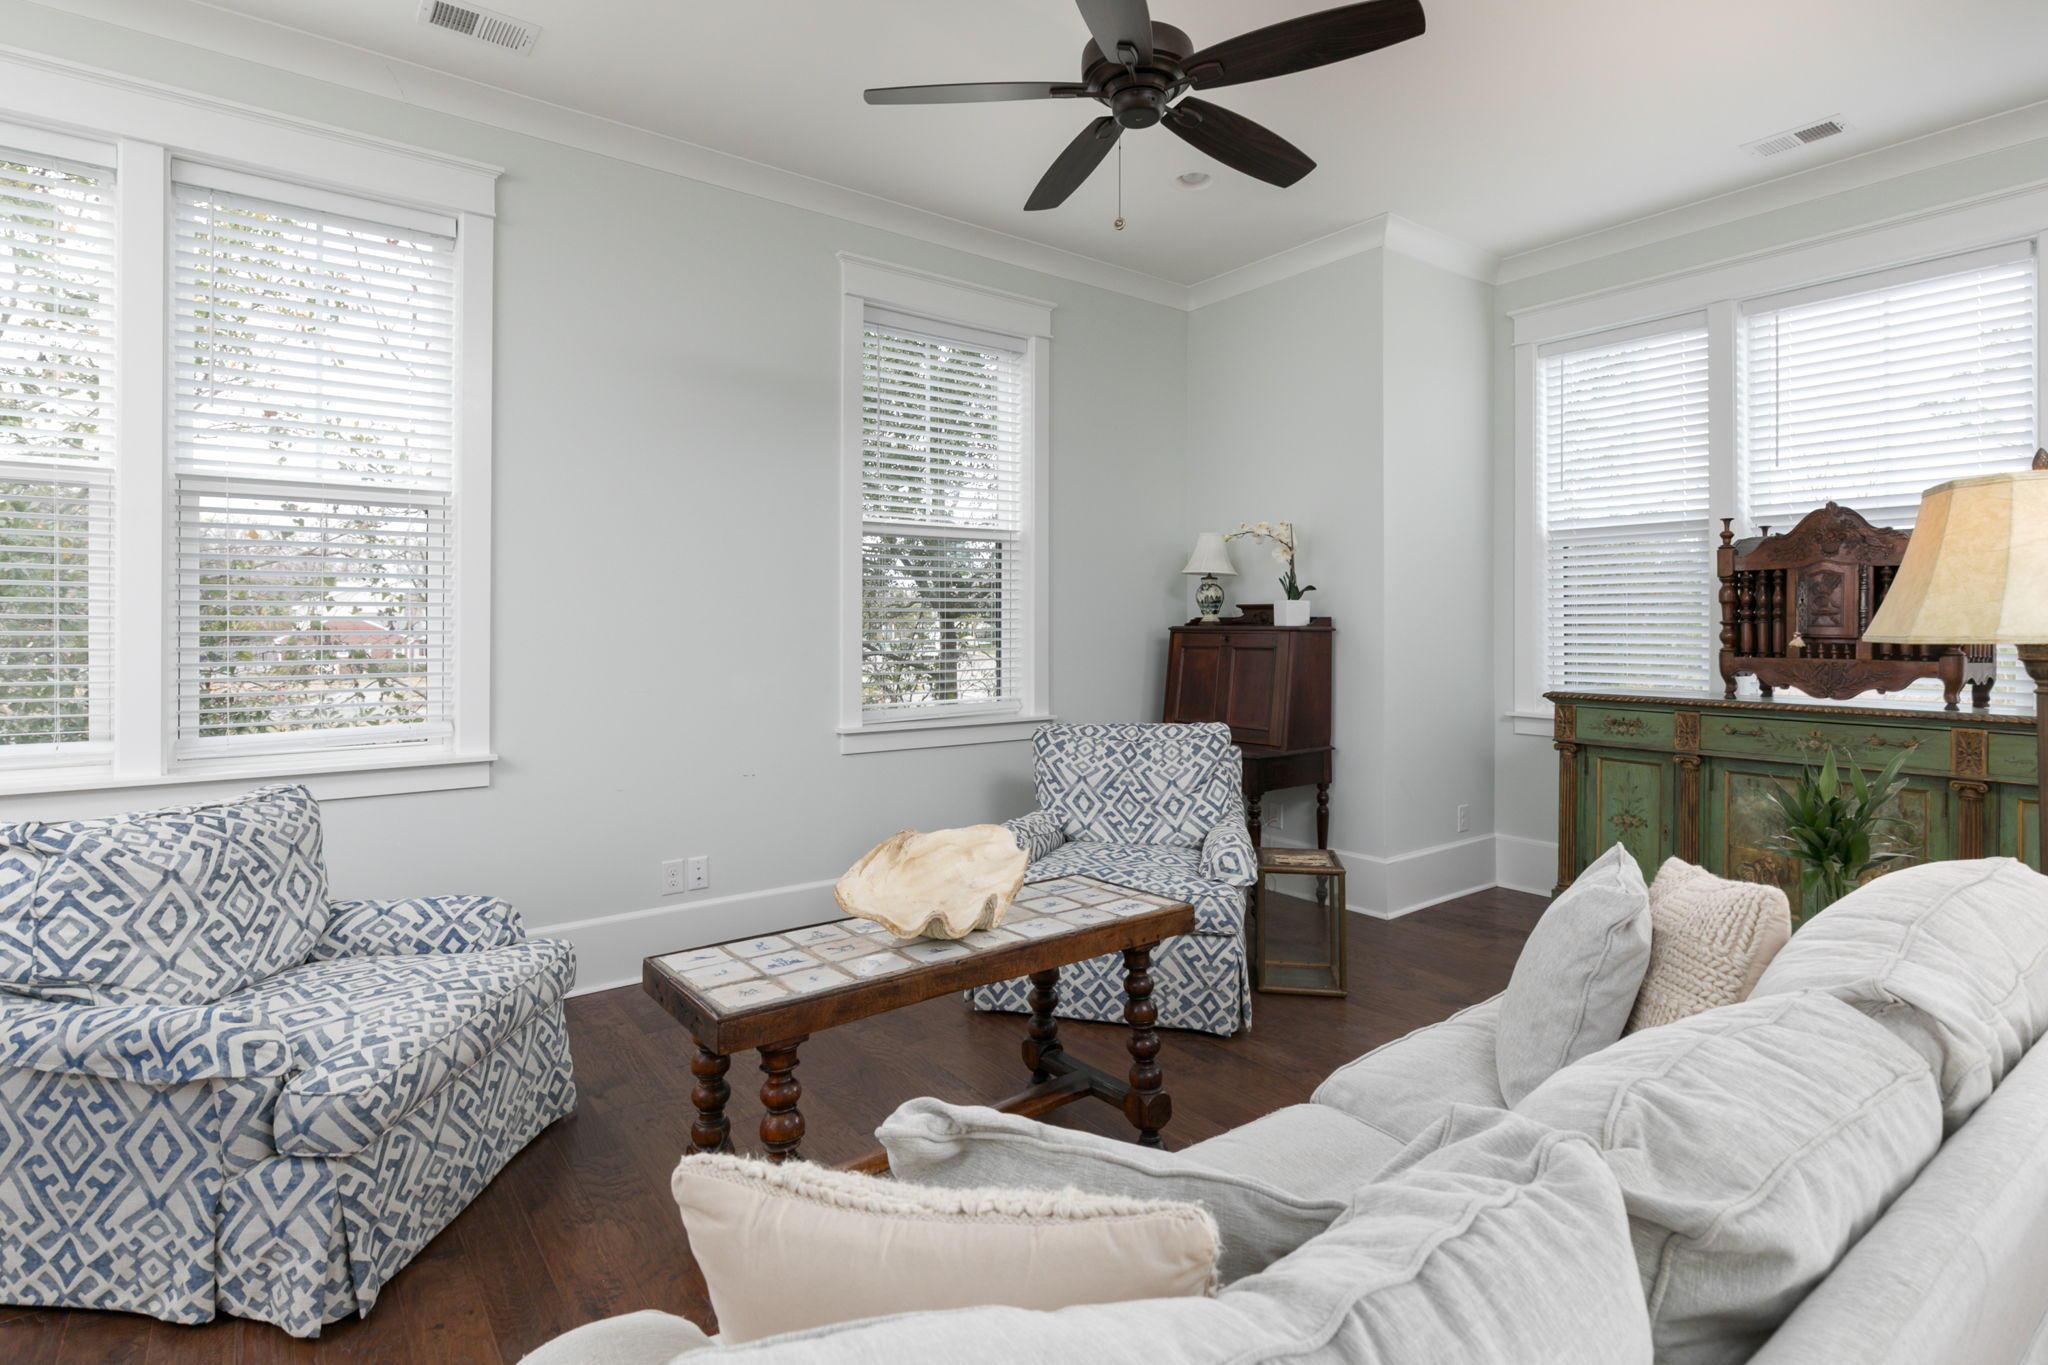 Sullivans Pointe Homes For Sale - 954 Key Colony, Mount Pleasant, SC - 27